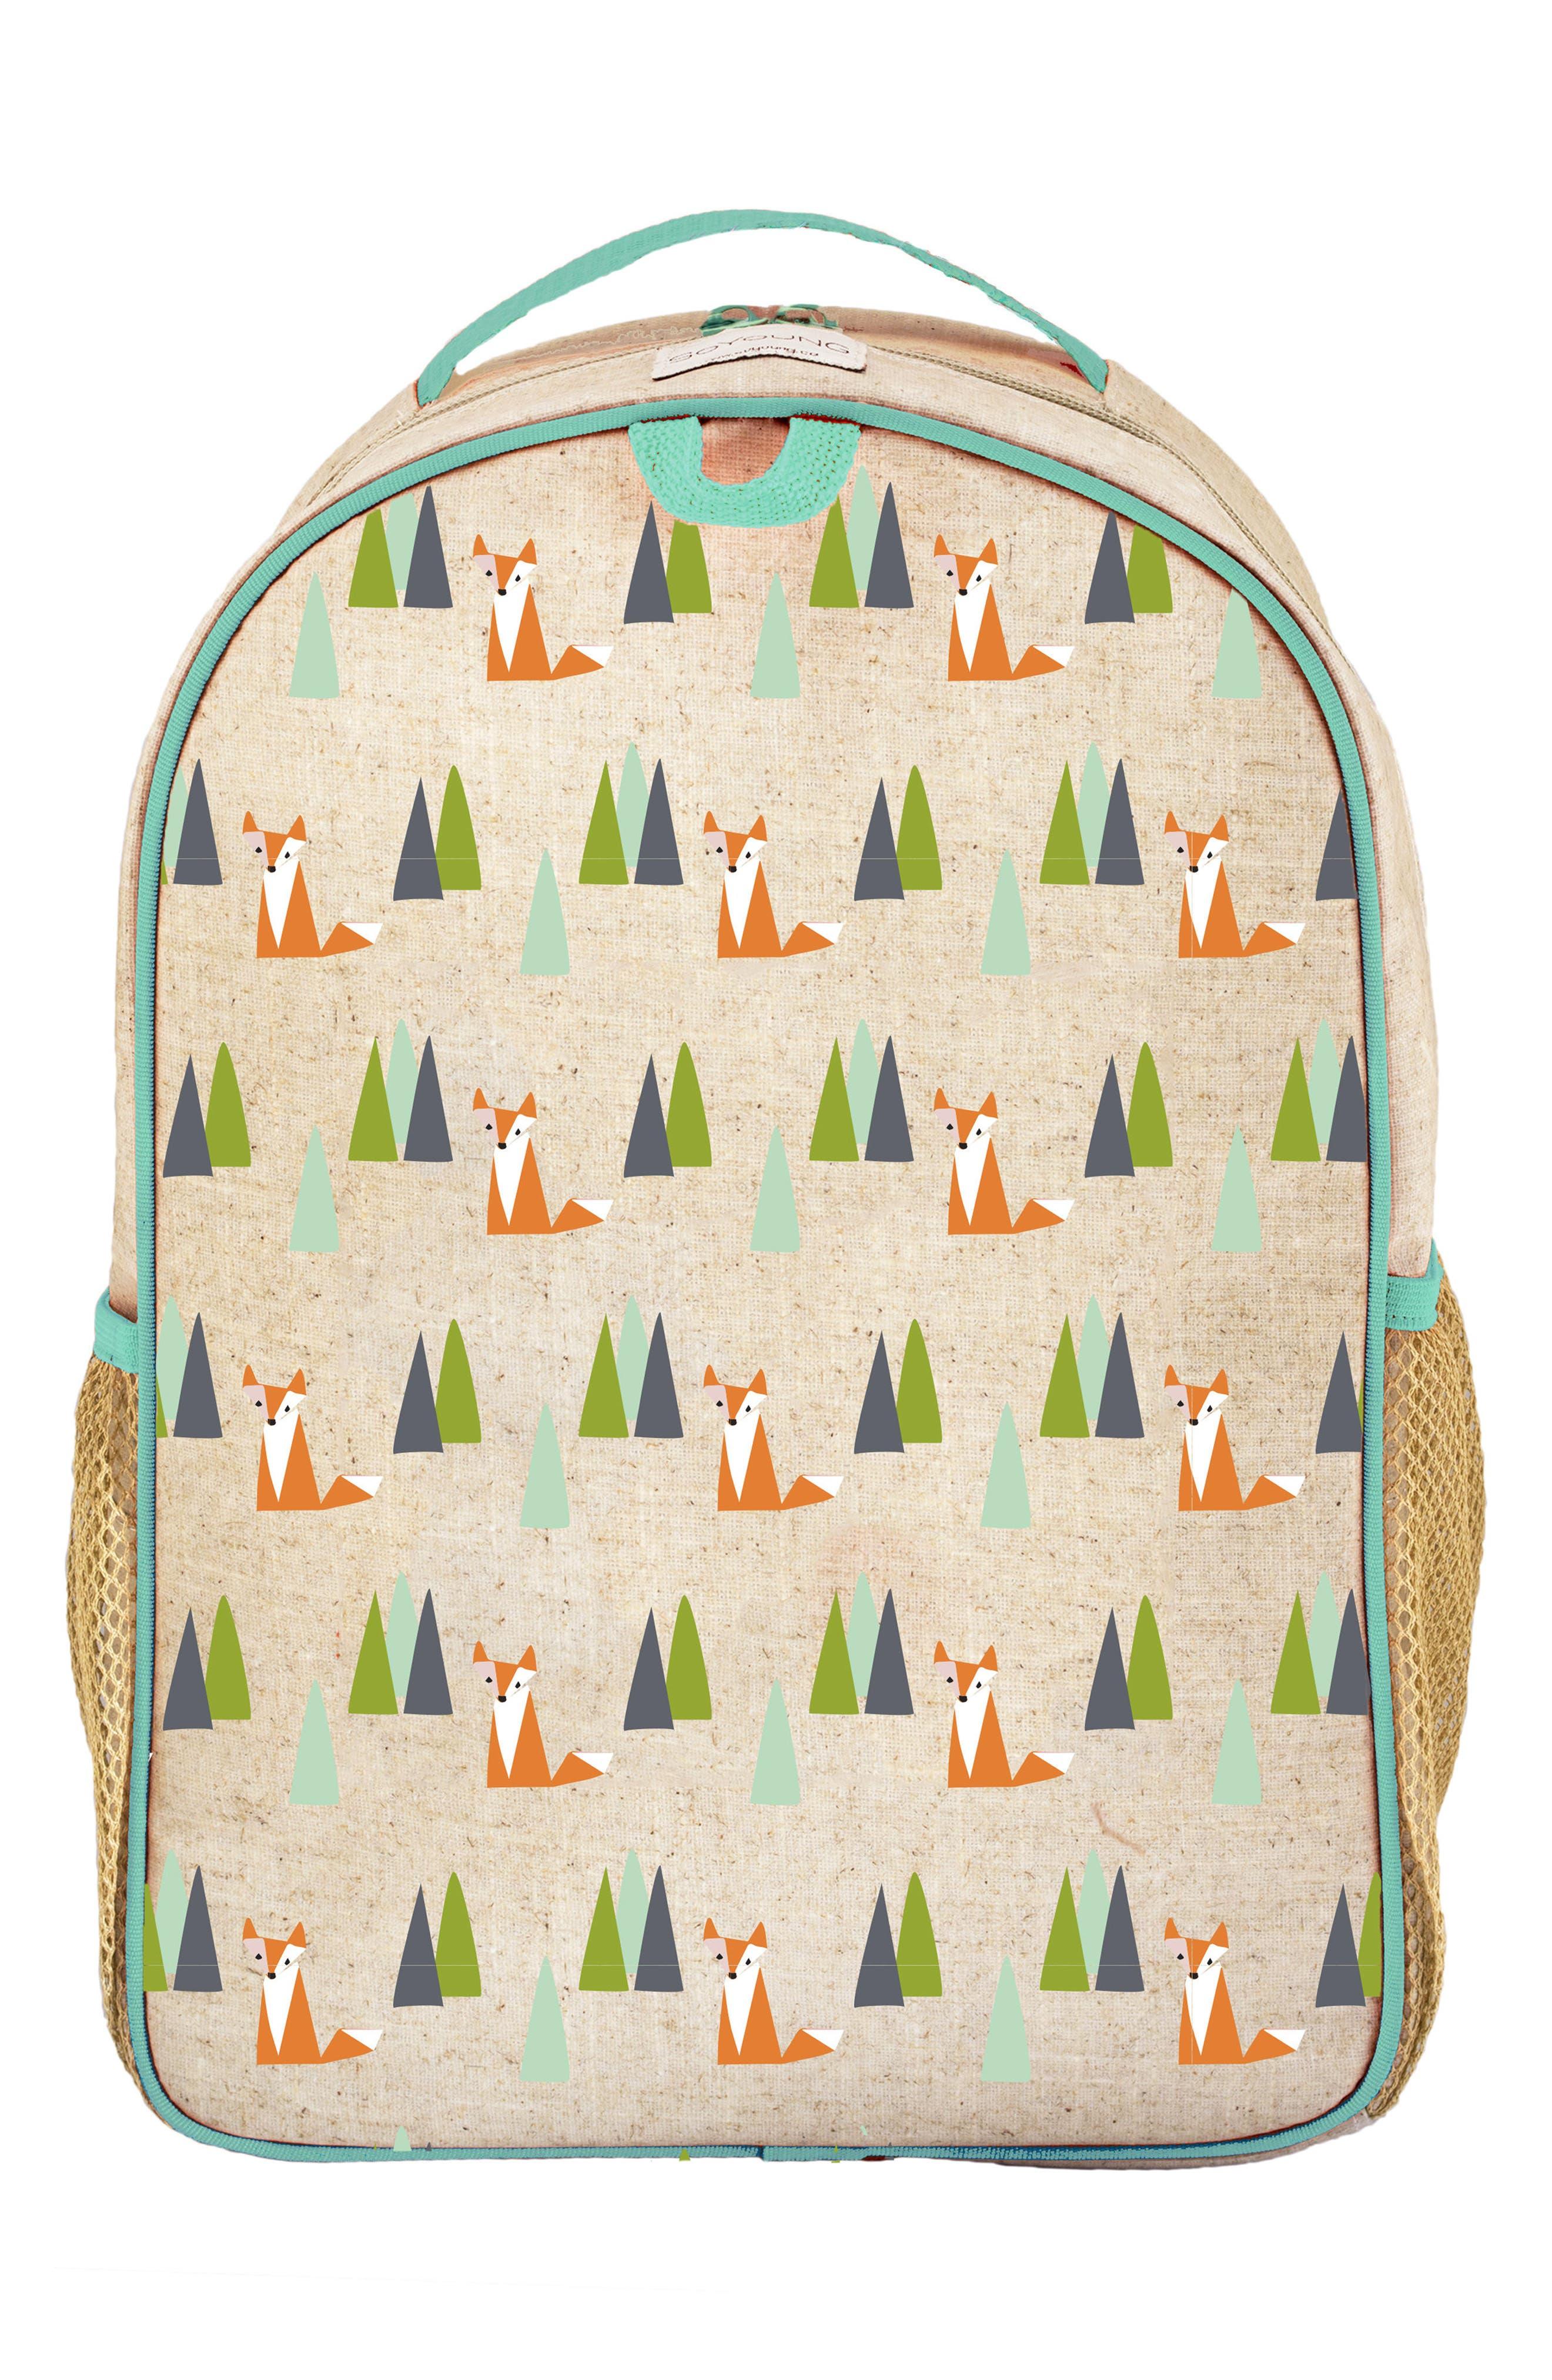 Raw Linen Toddler Backpack,                             Main thumbnail 2, color,